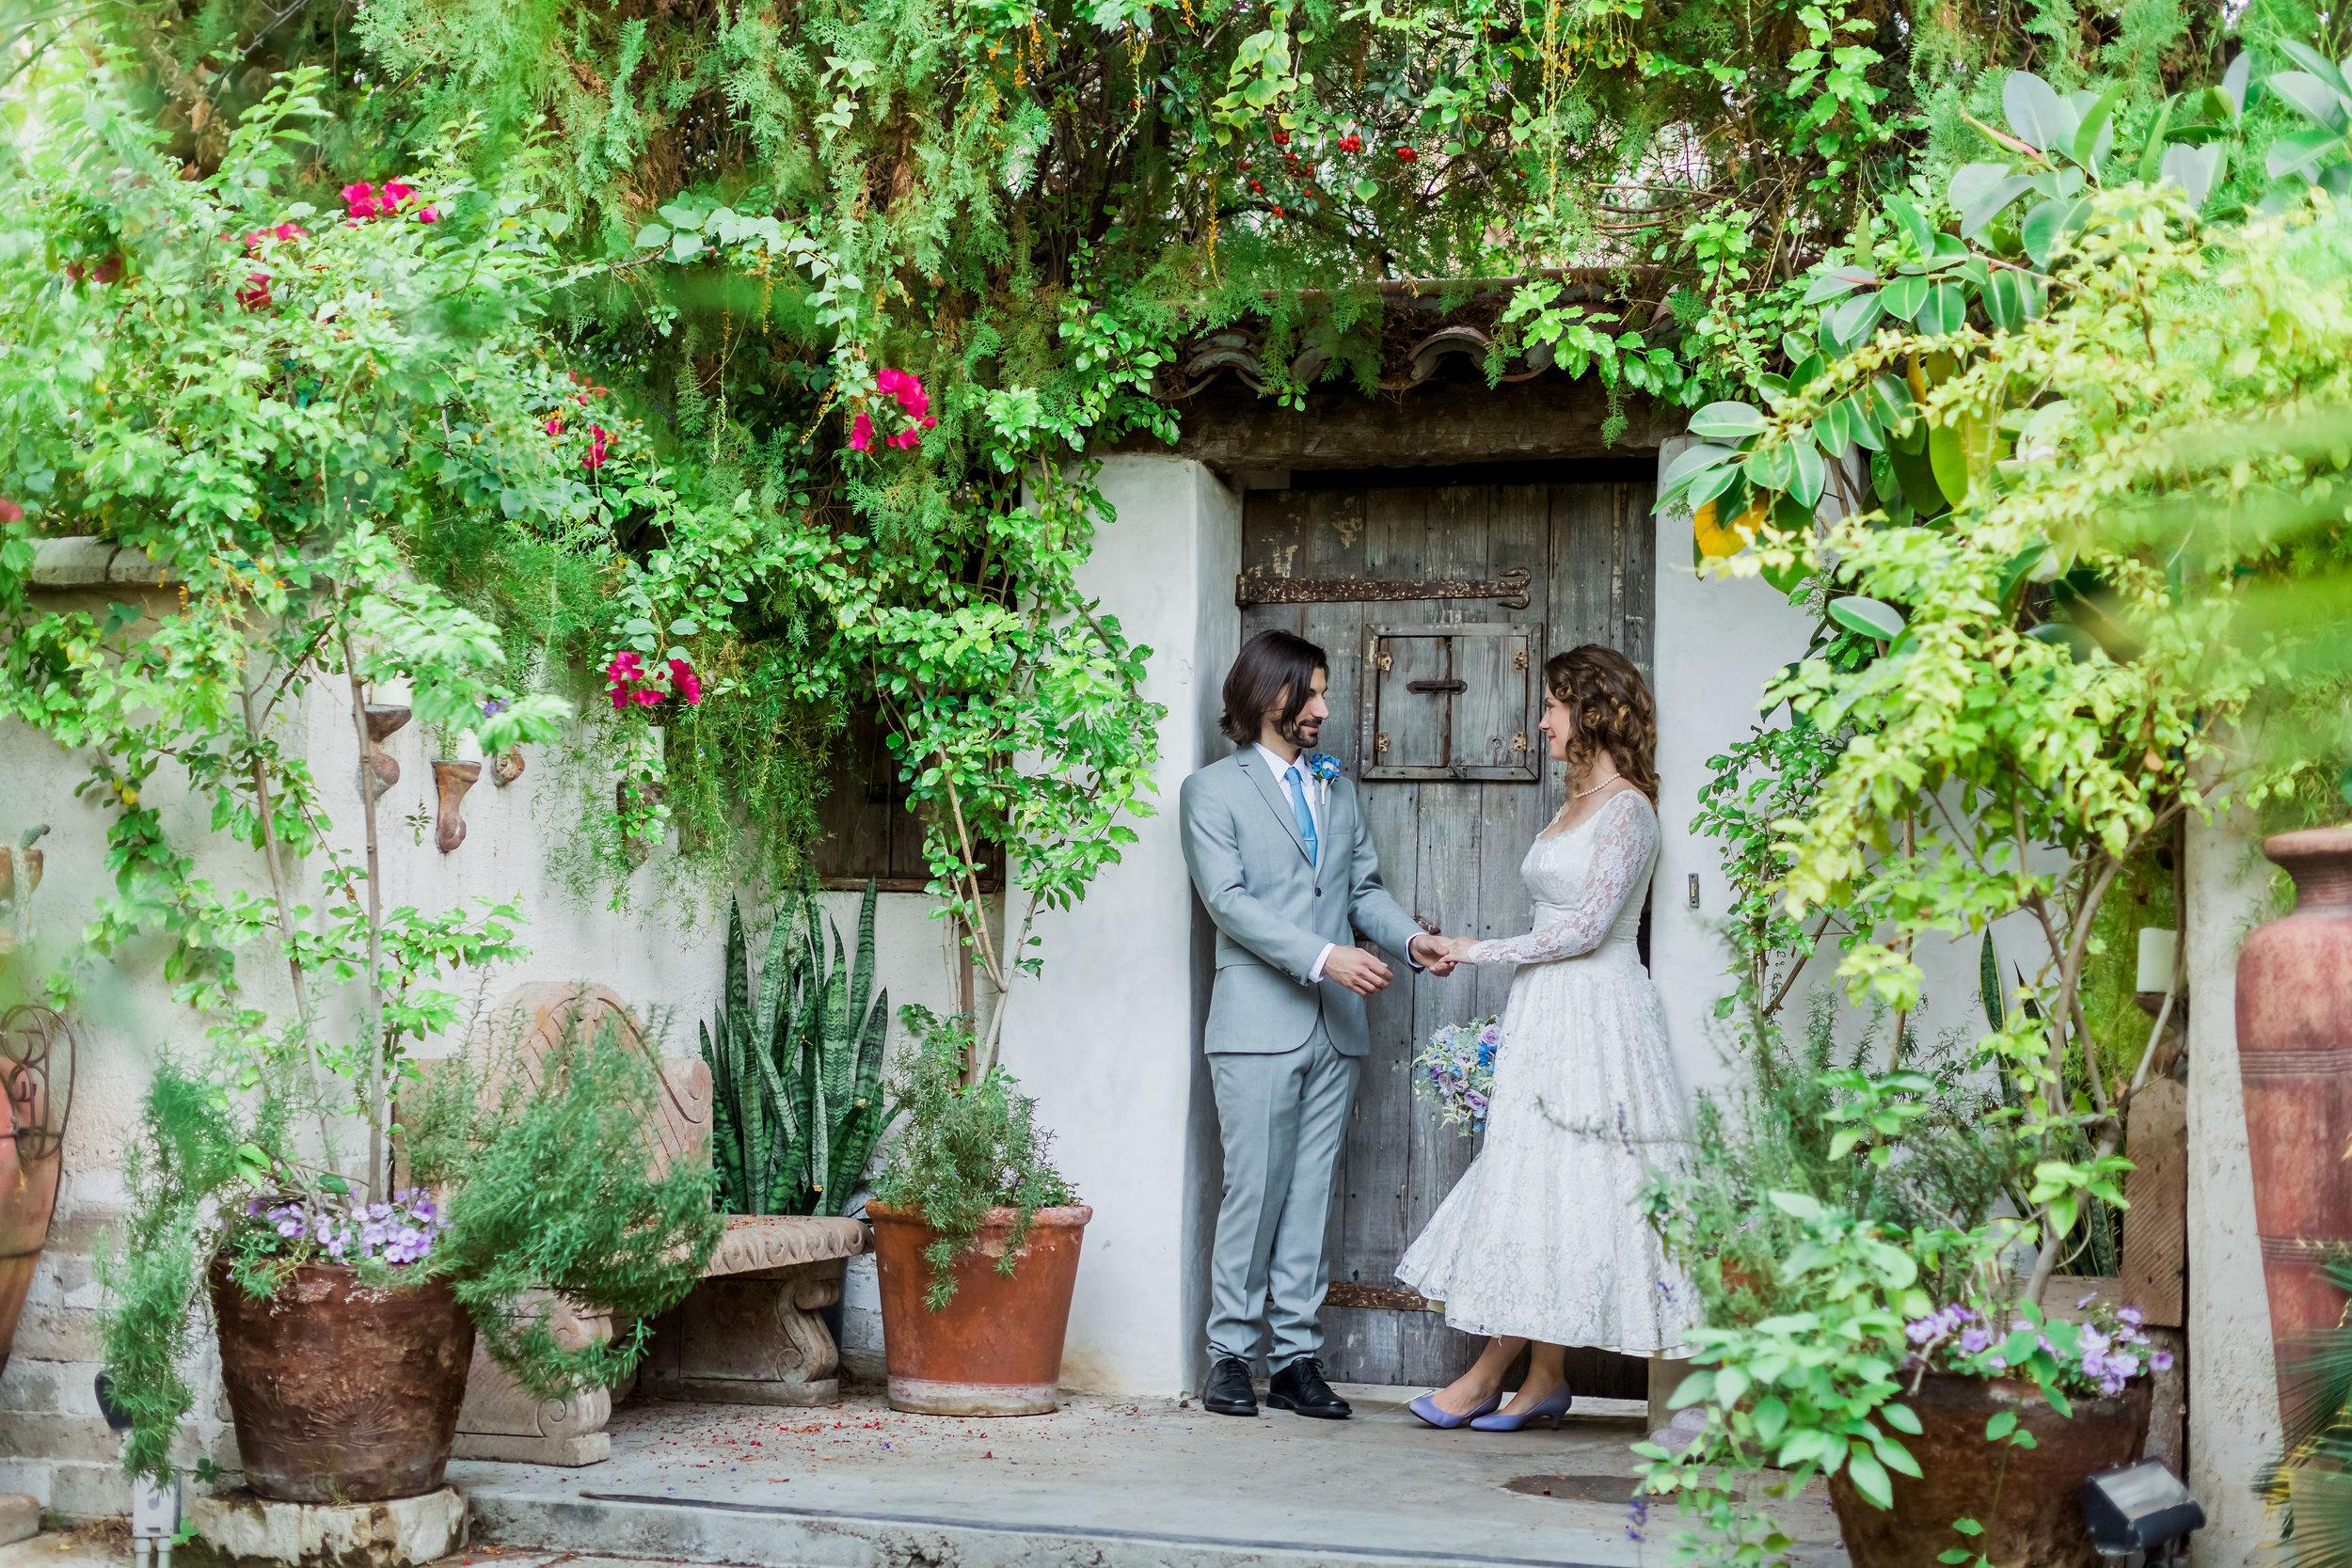 Elizabeth.Jonothan.wedding.2018.monocle.project-263.jpg